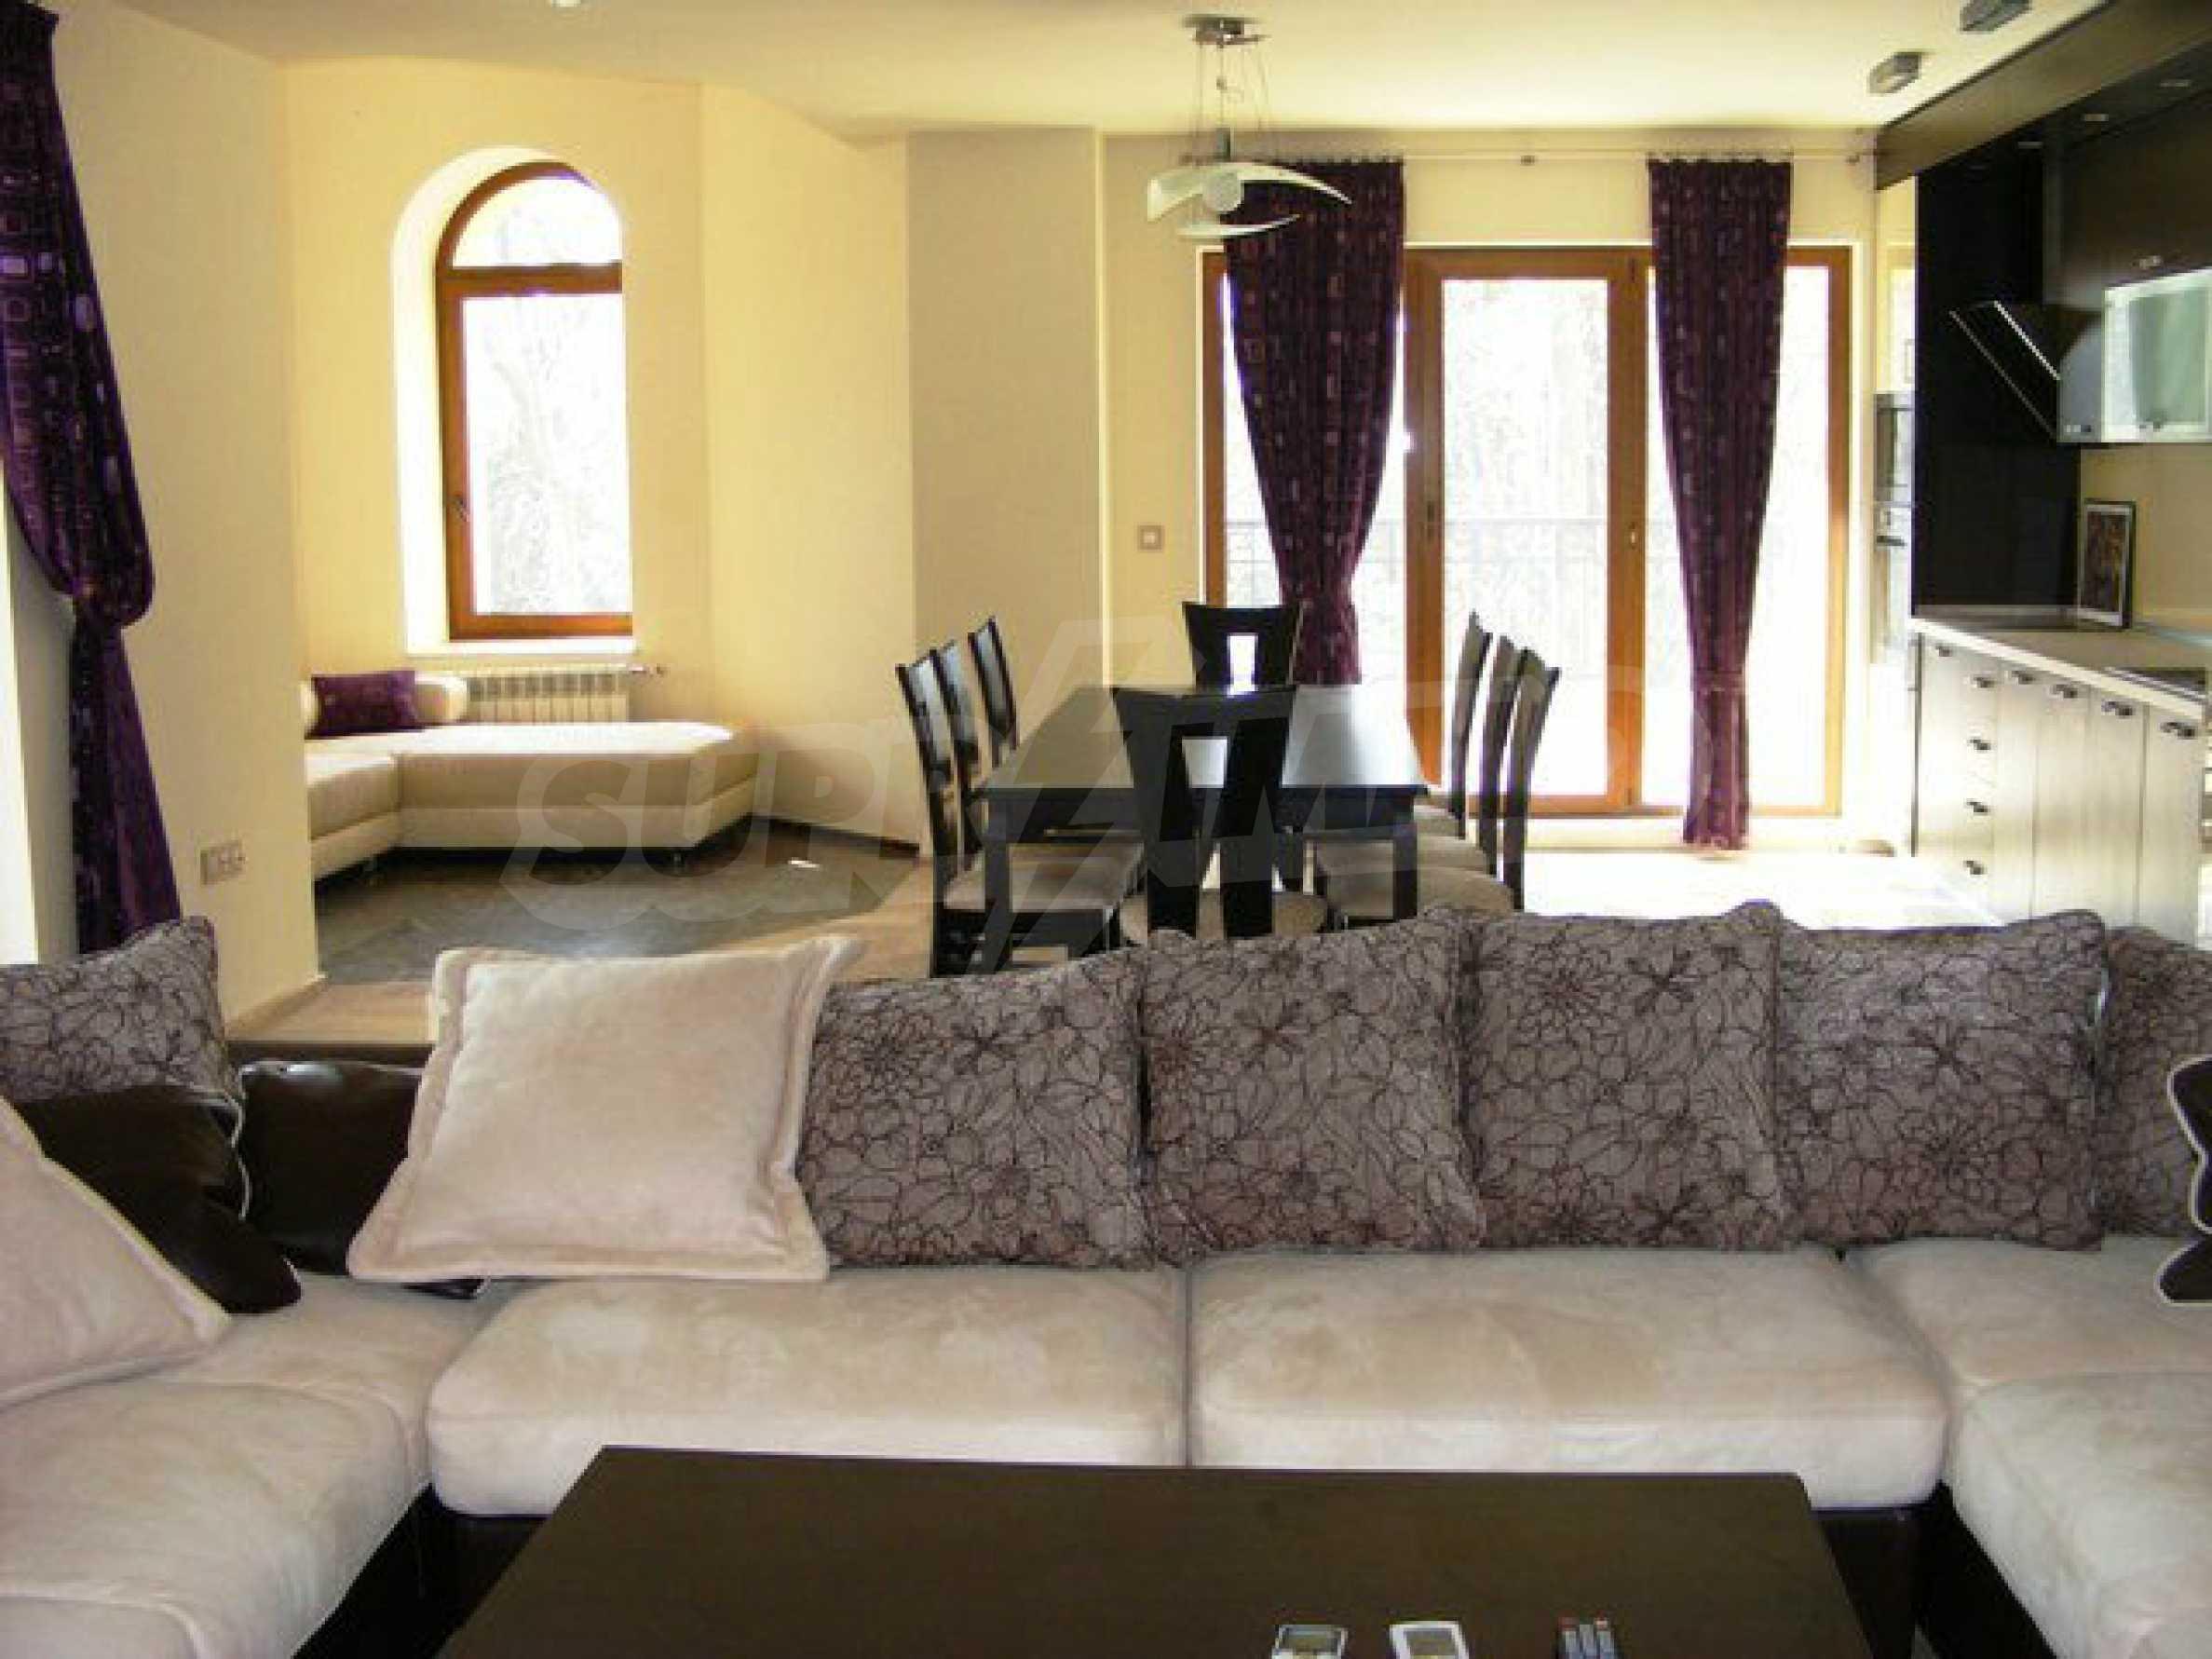 Apartment Deizy 1